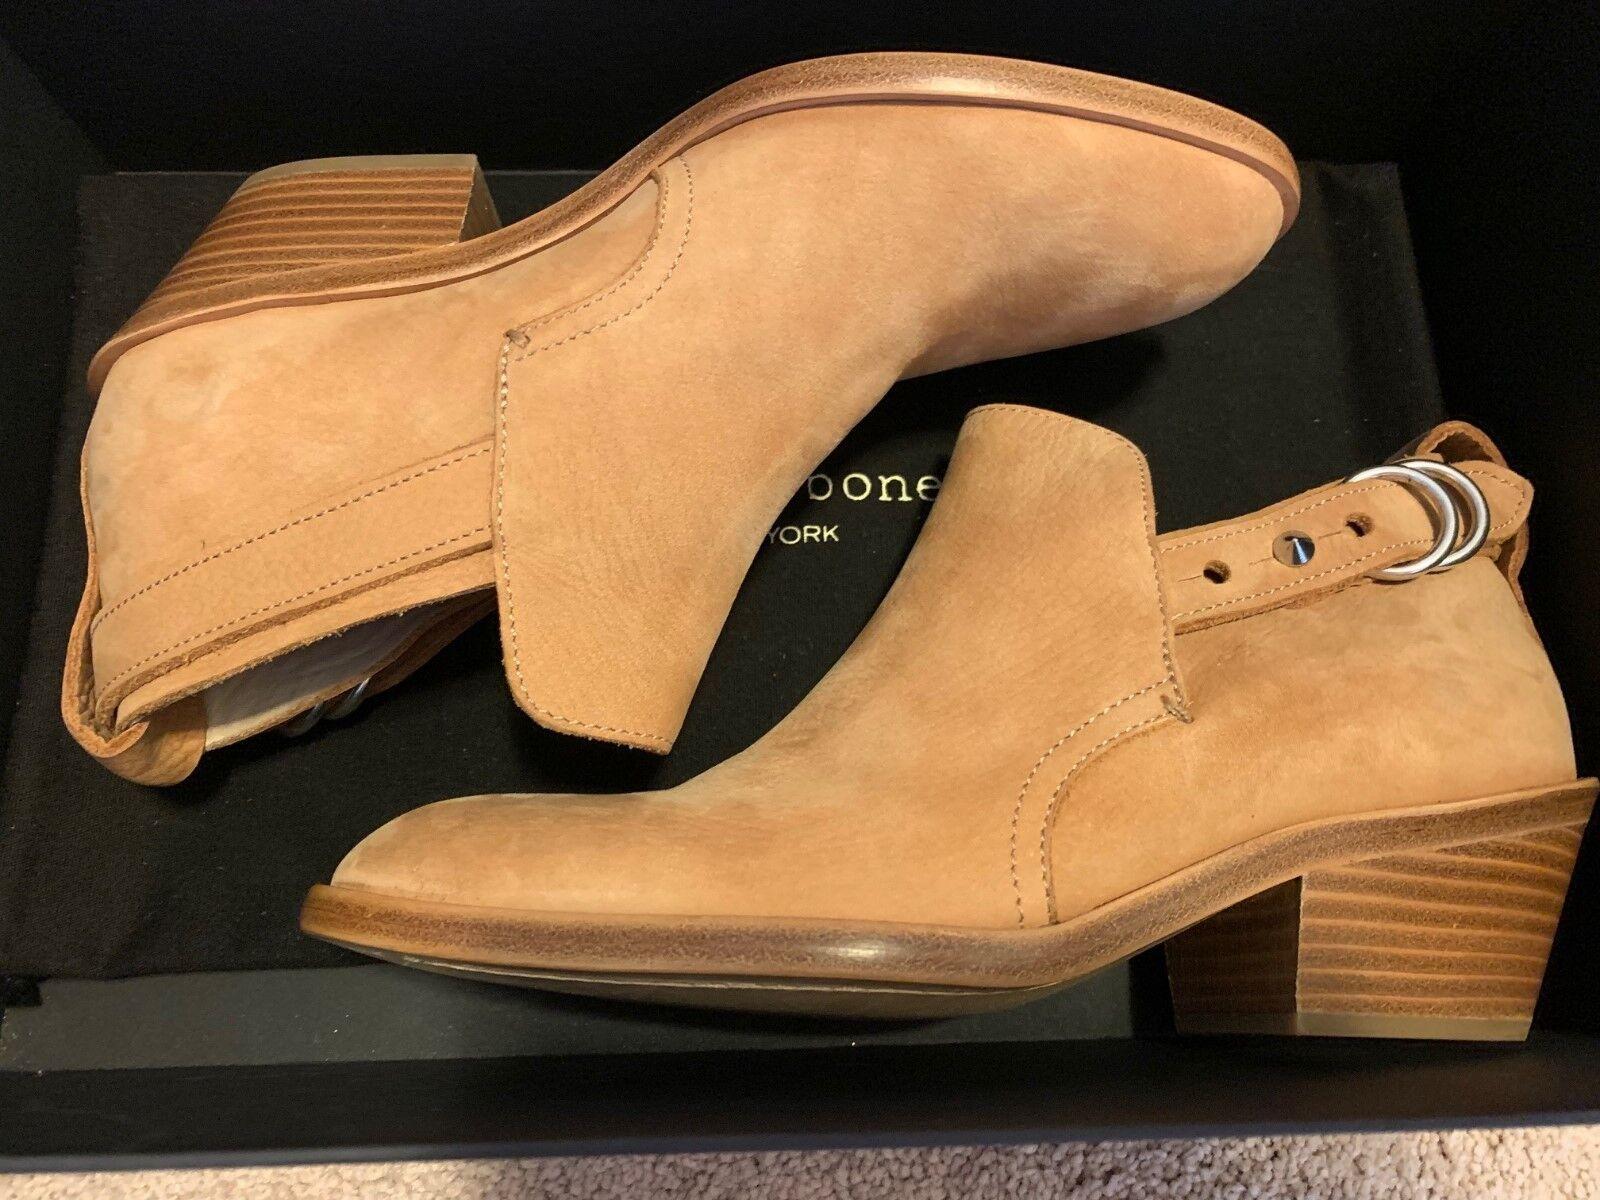 Rag & Bone Sullivan Stiefel Größe 6 36 Tan Nubuck New in Box